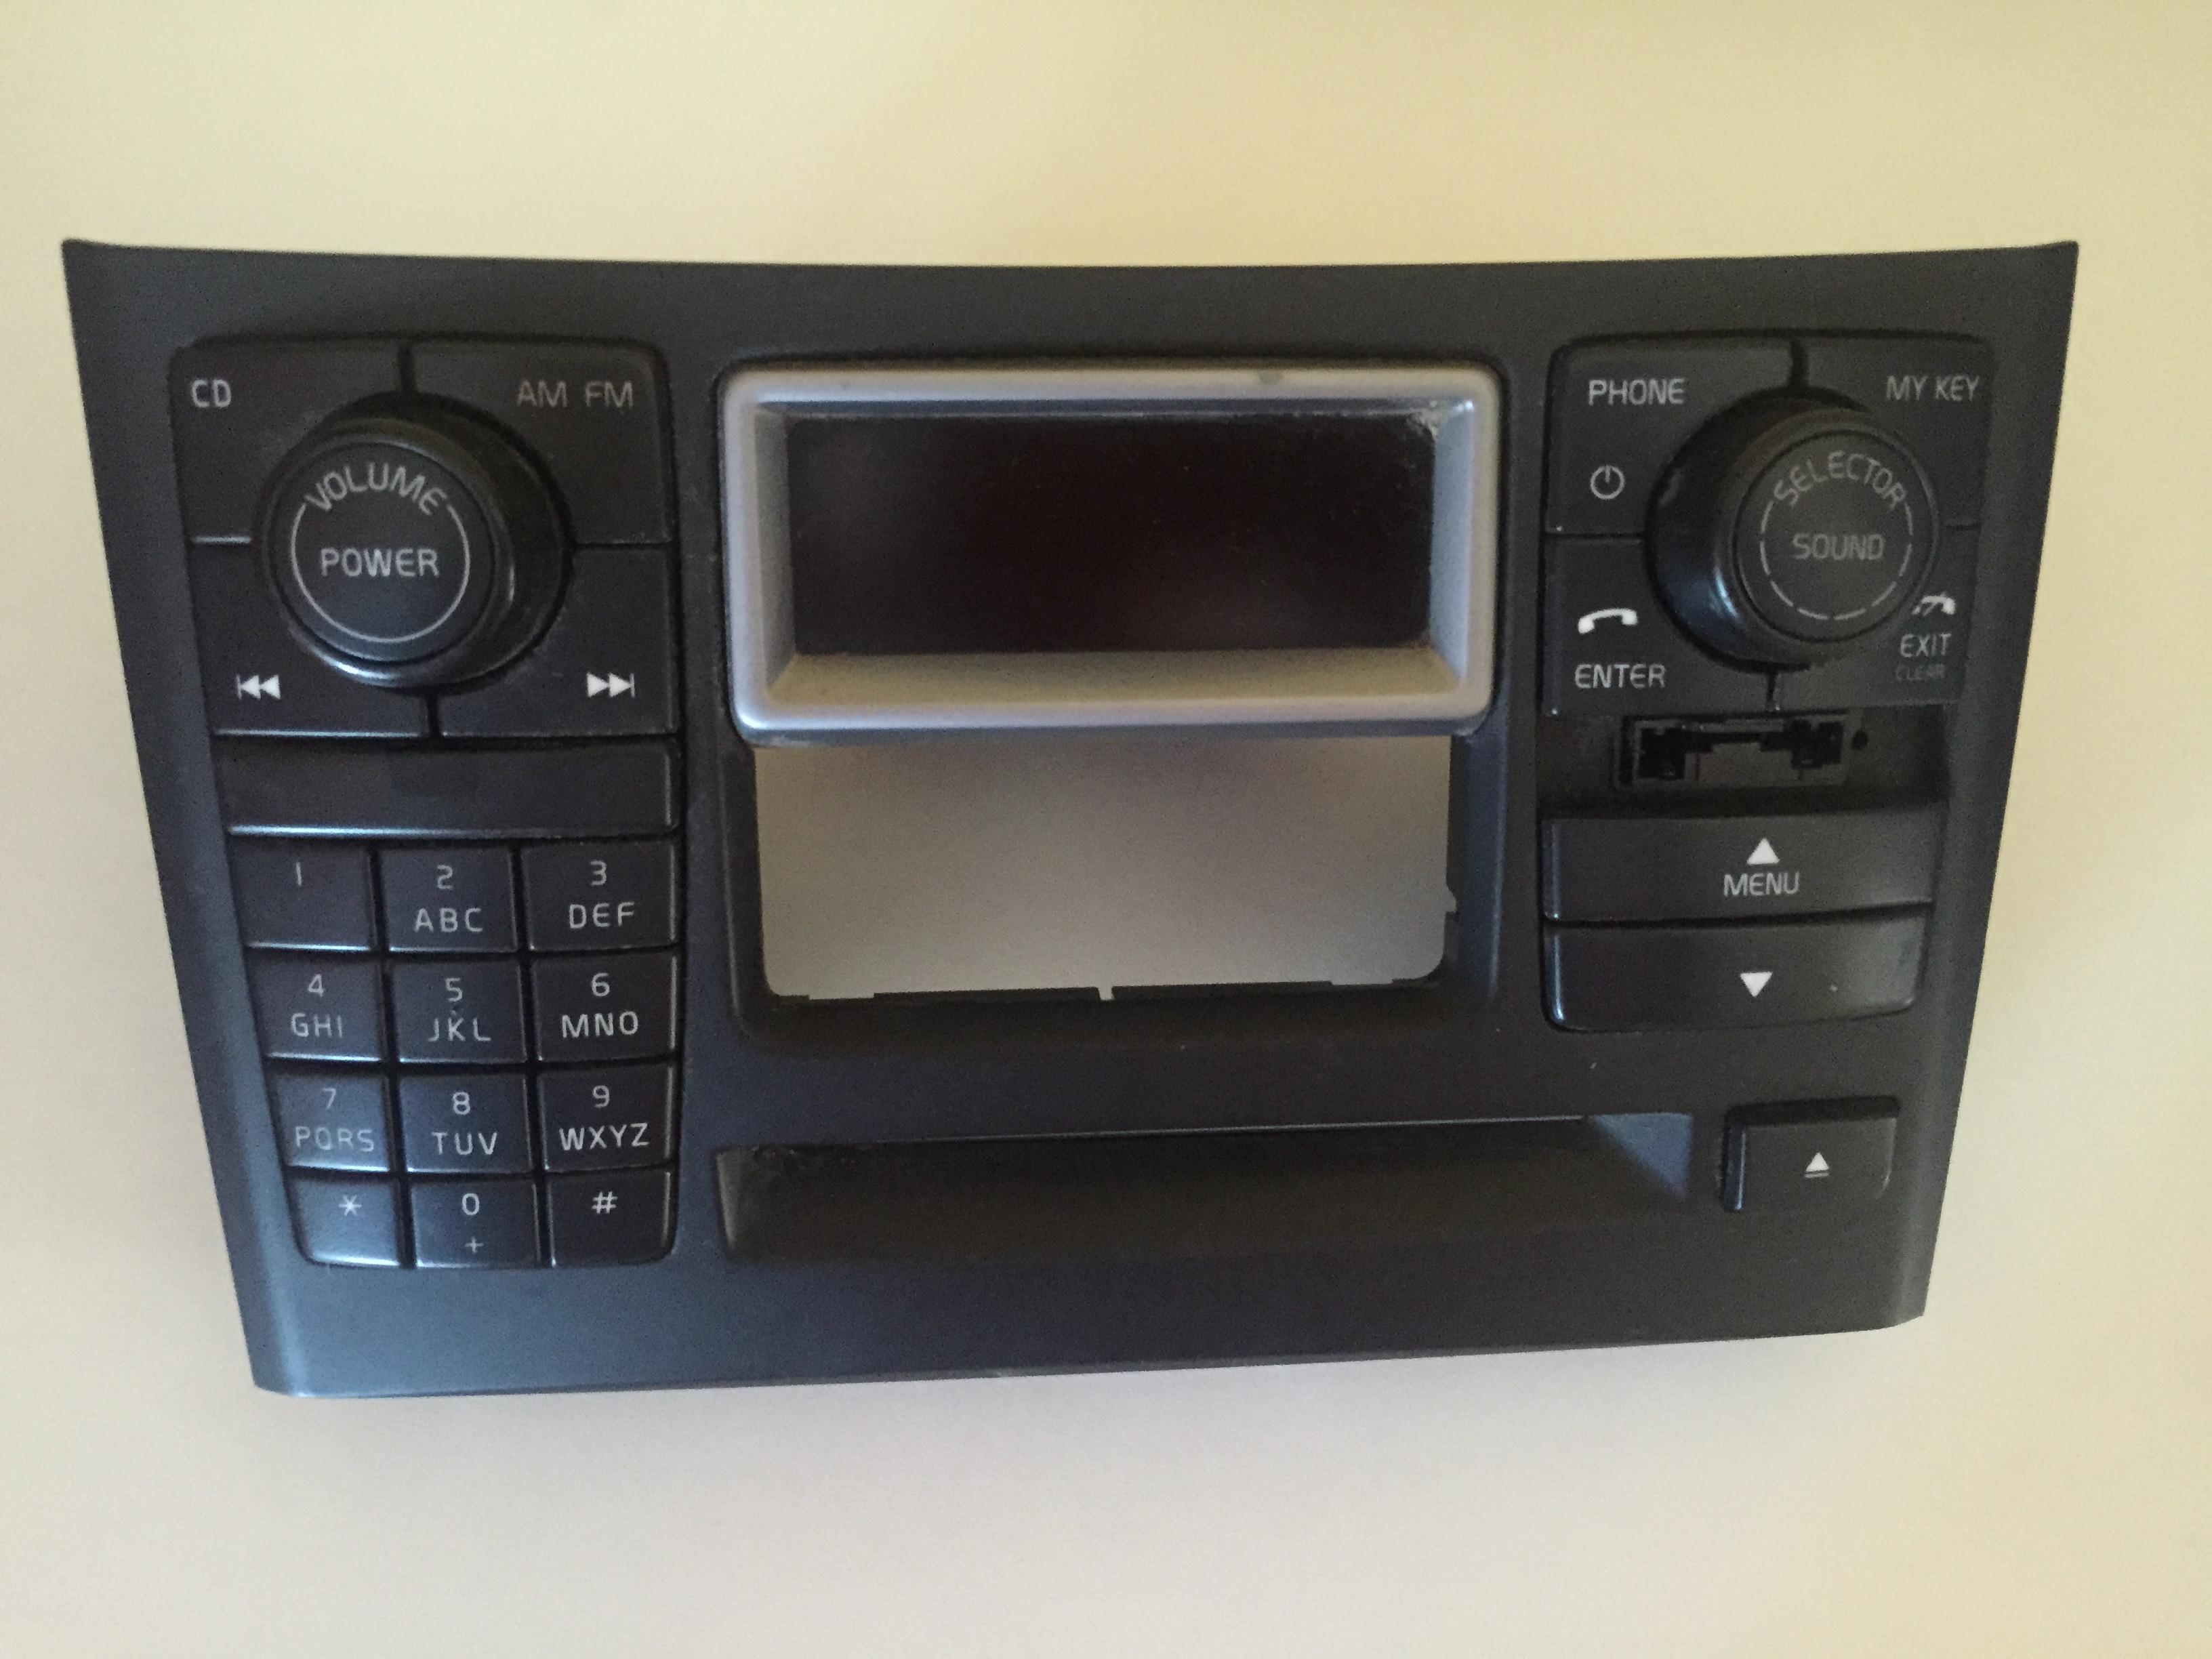 volvo xc90 radio ICM display matrix w/phone w/sim card 03-06